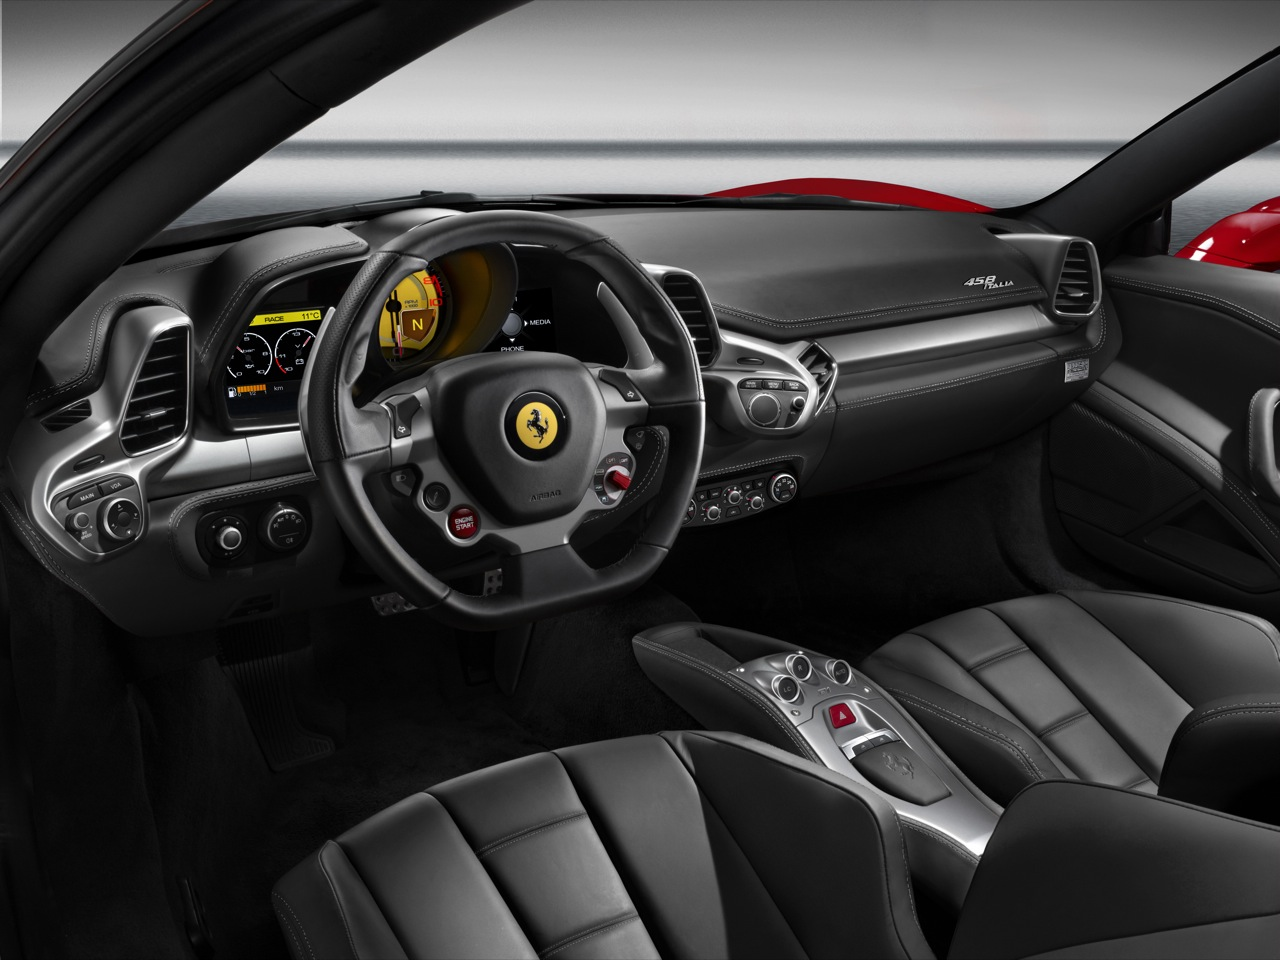 ferrari italia 458 - Ferrari Italia 458